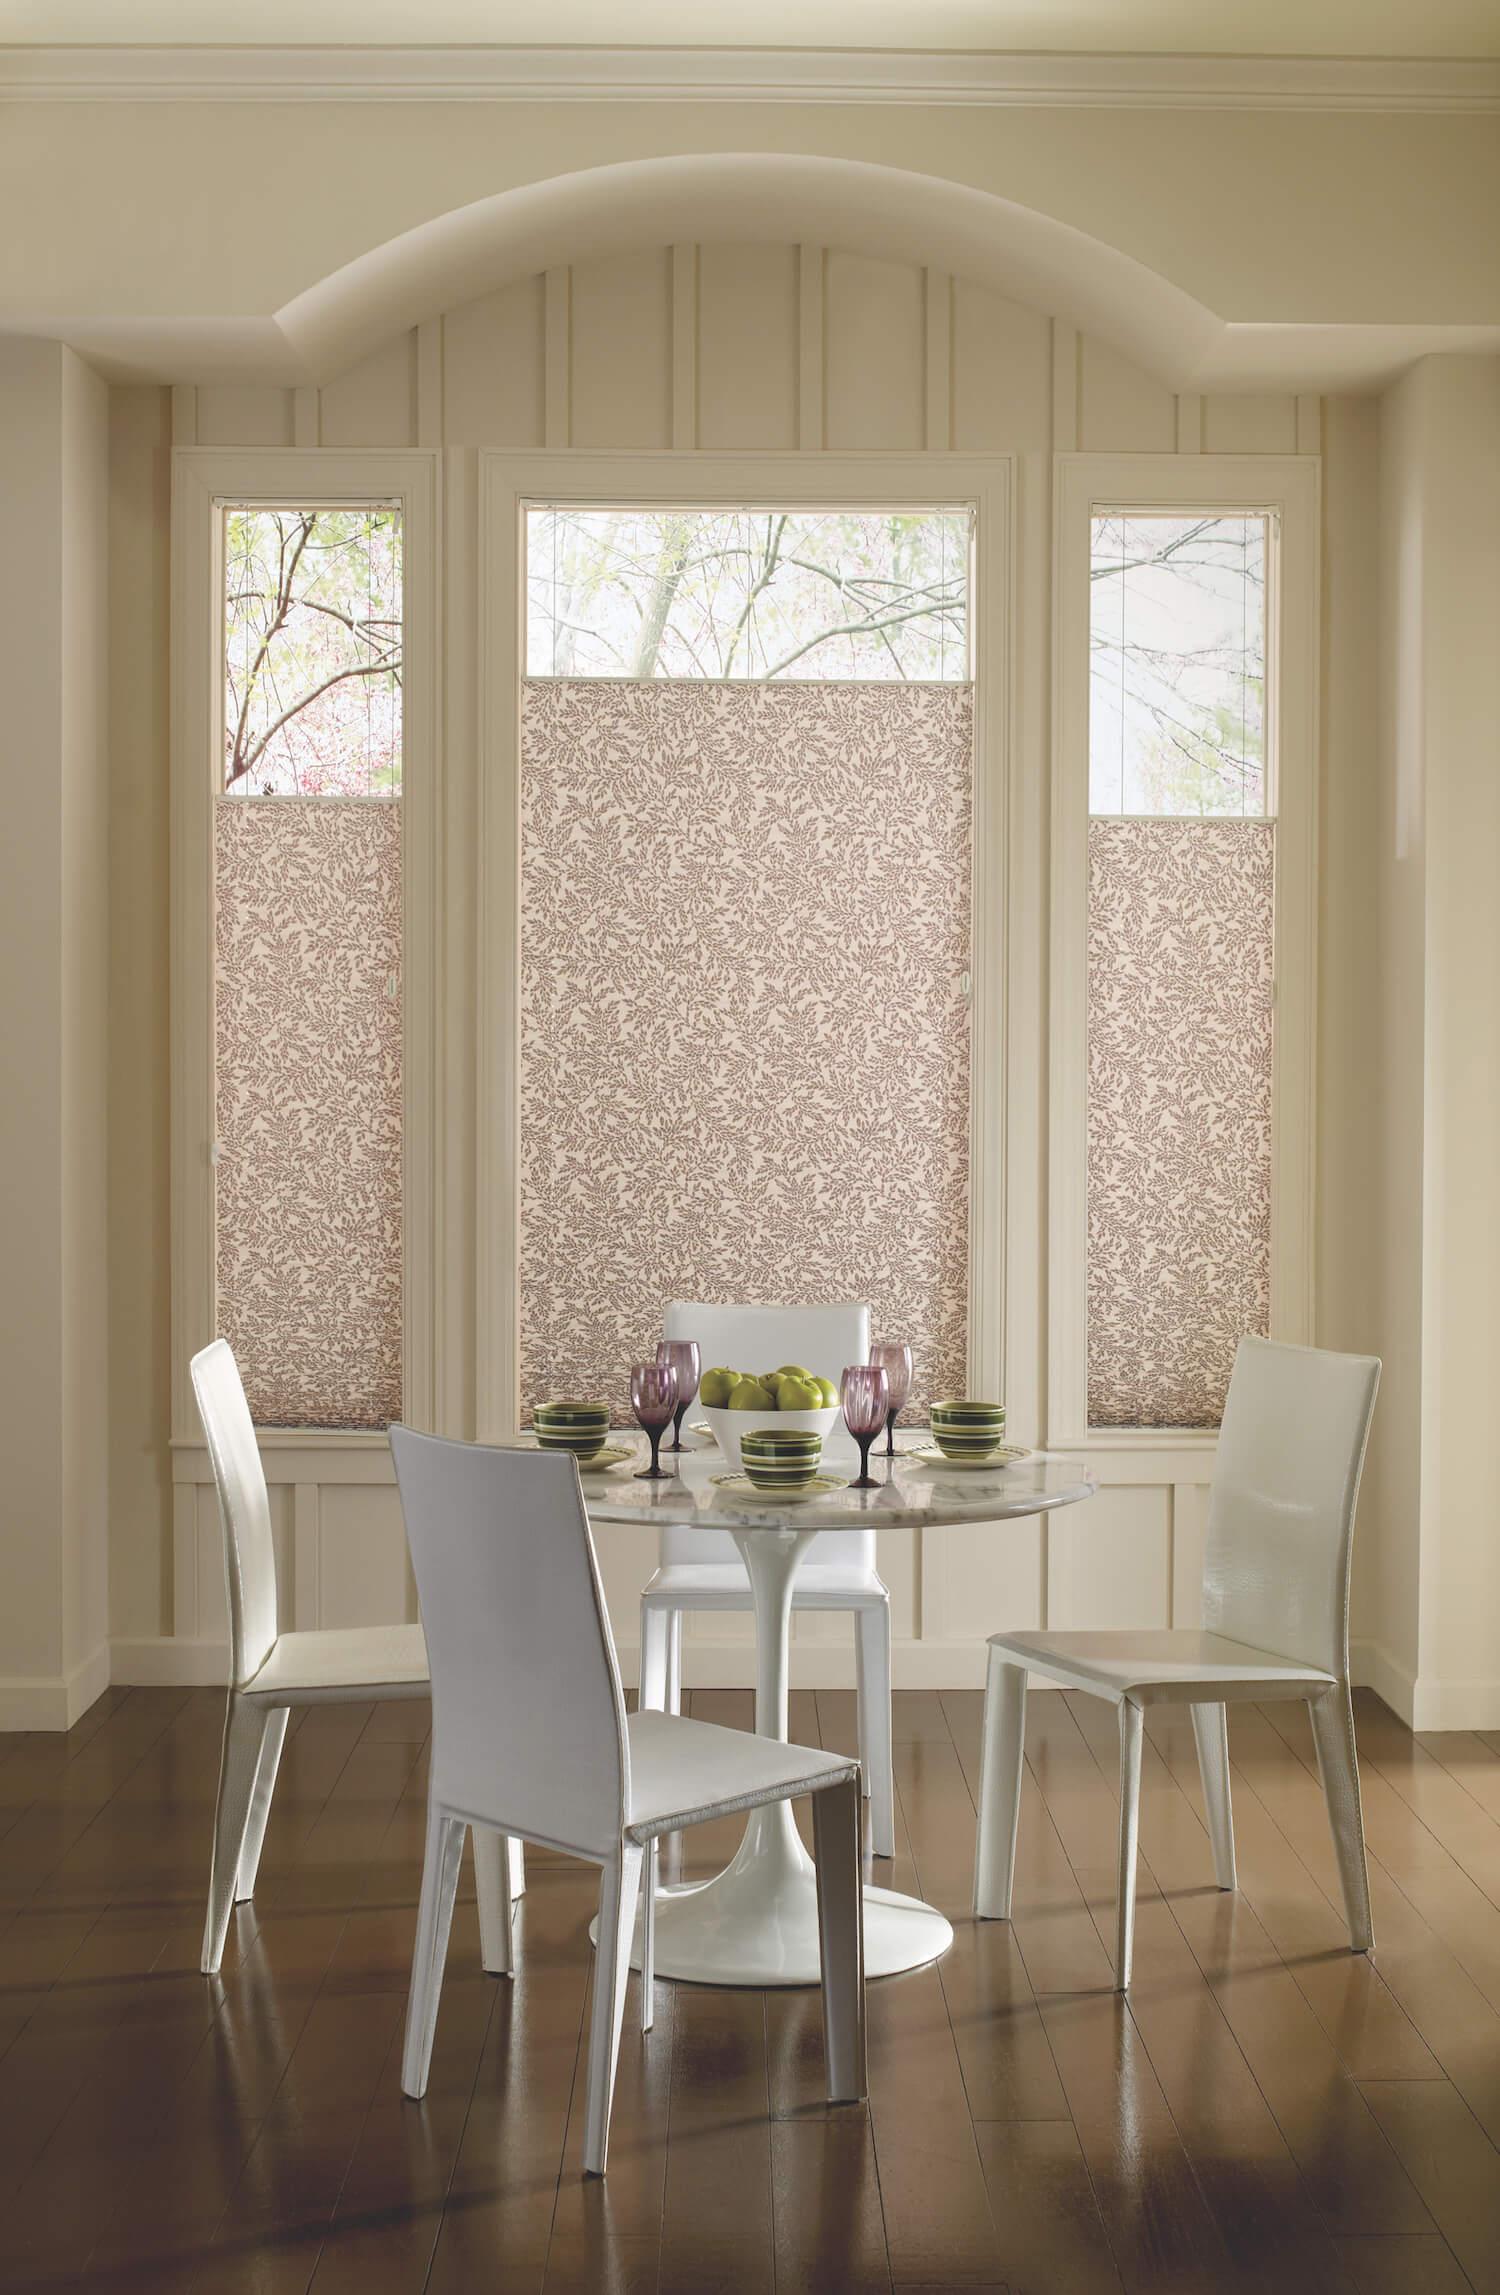 Hunter Douglas pleated shades on dining room bay window